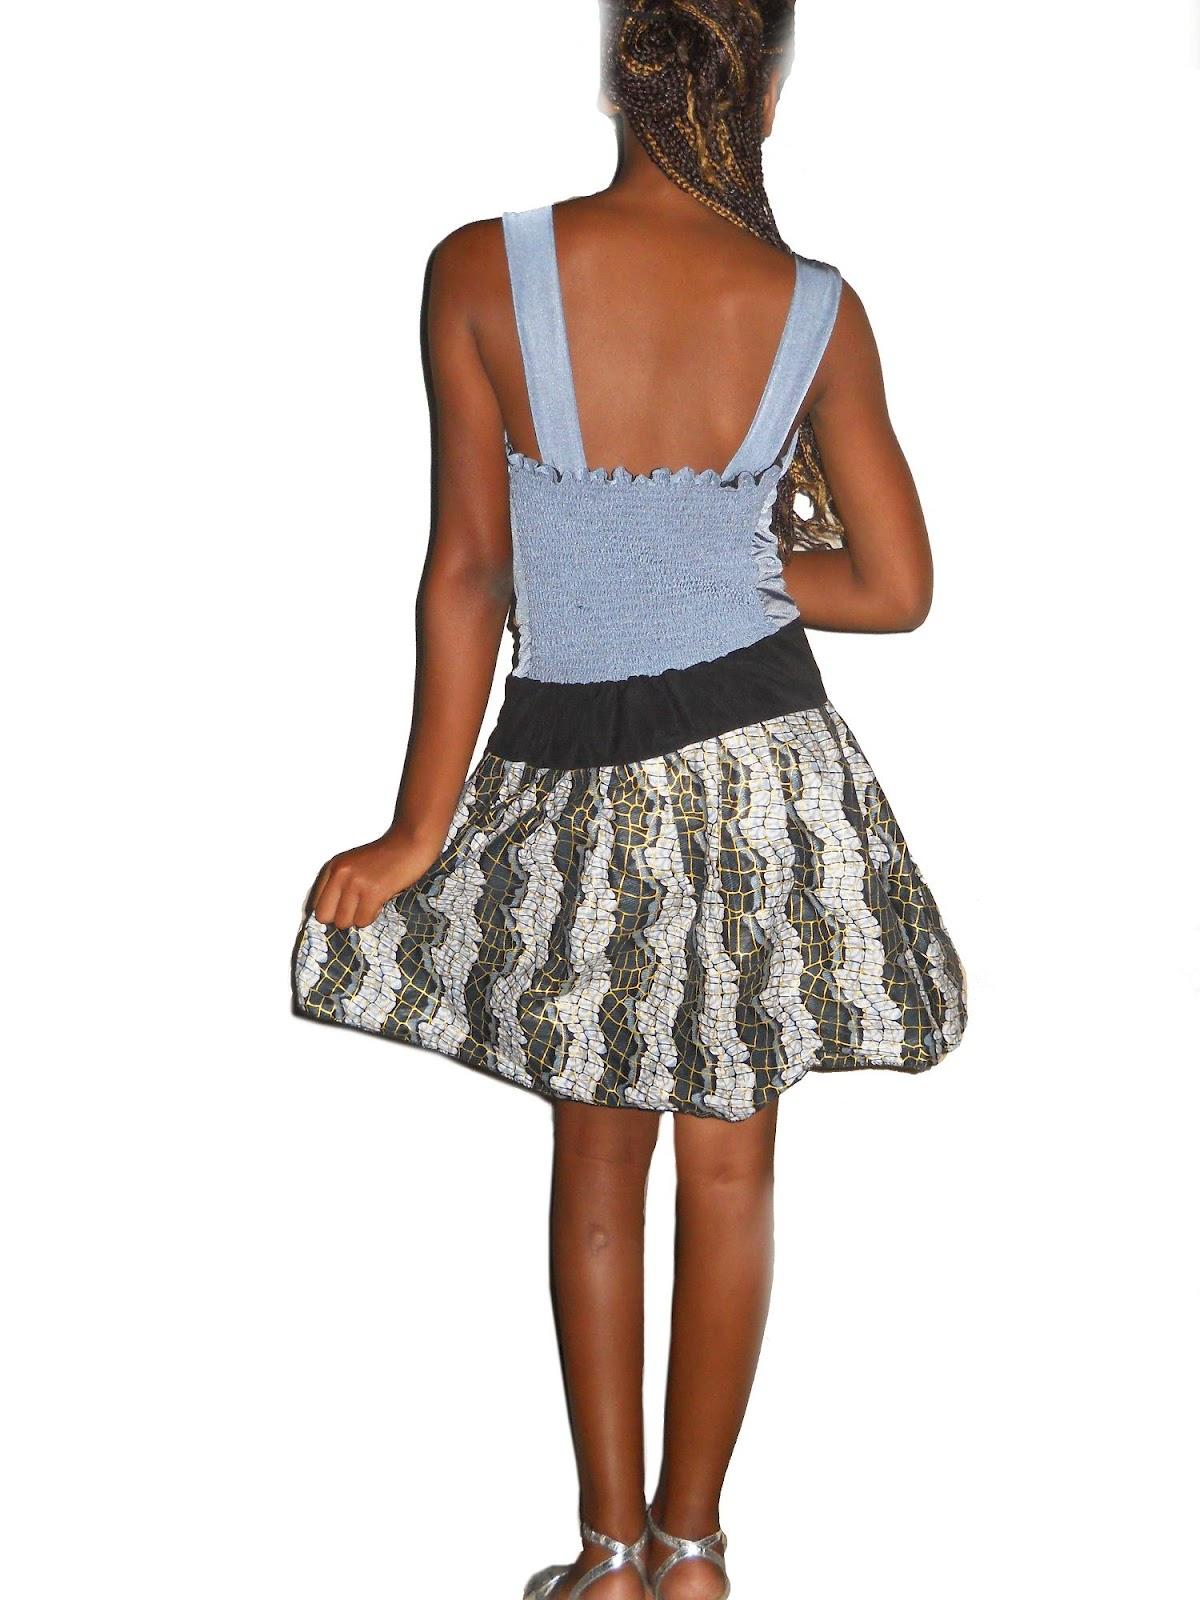 RINEEZ ARTS - African Culture Stuffs: Two-tones Dress